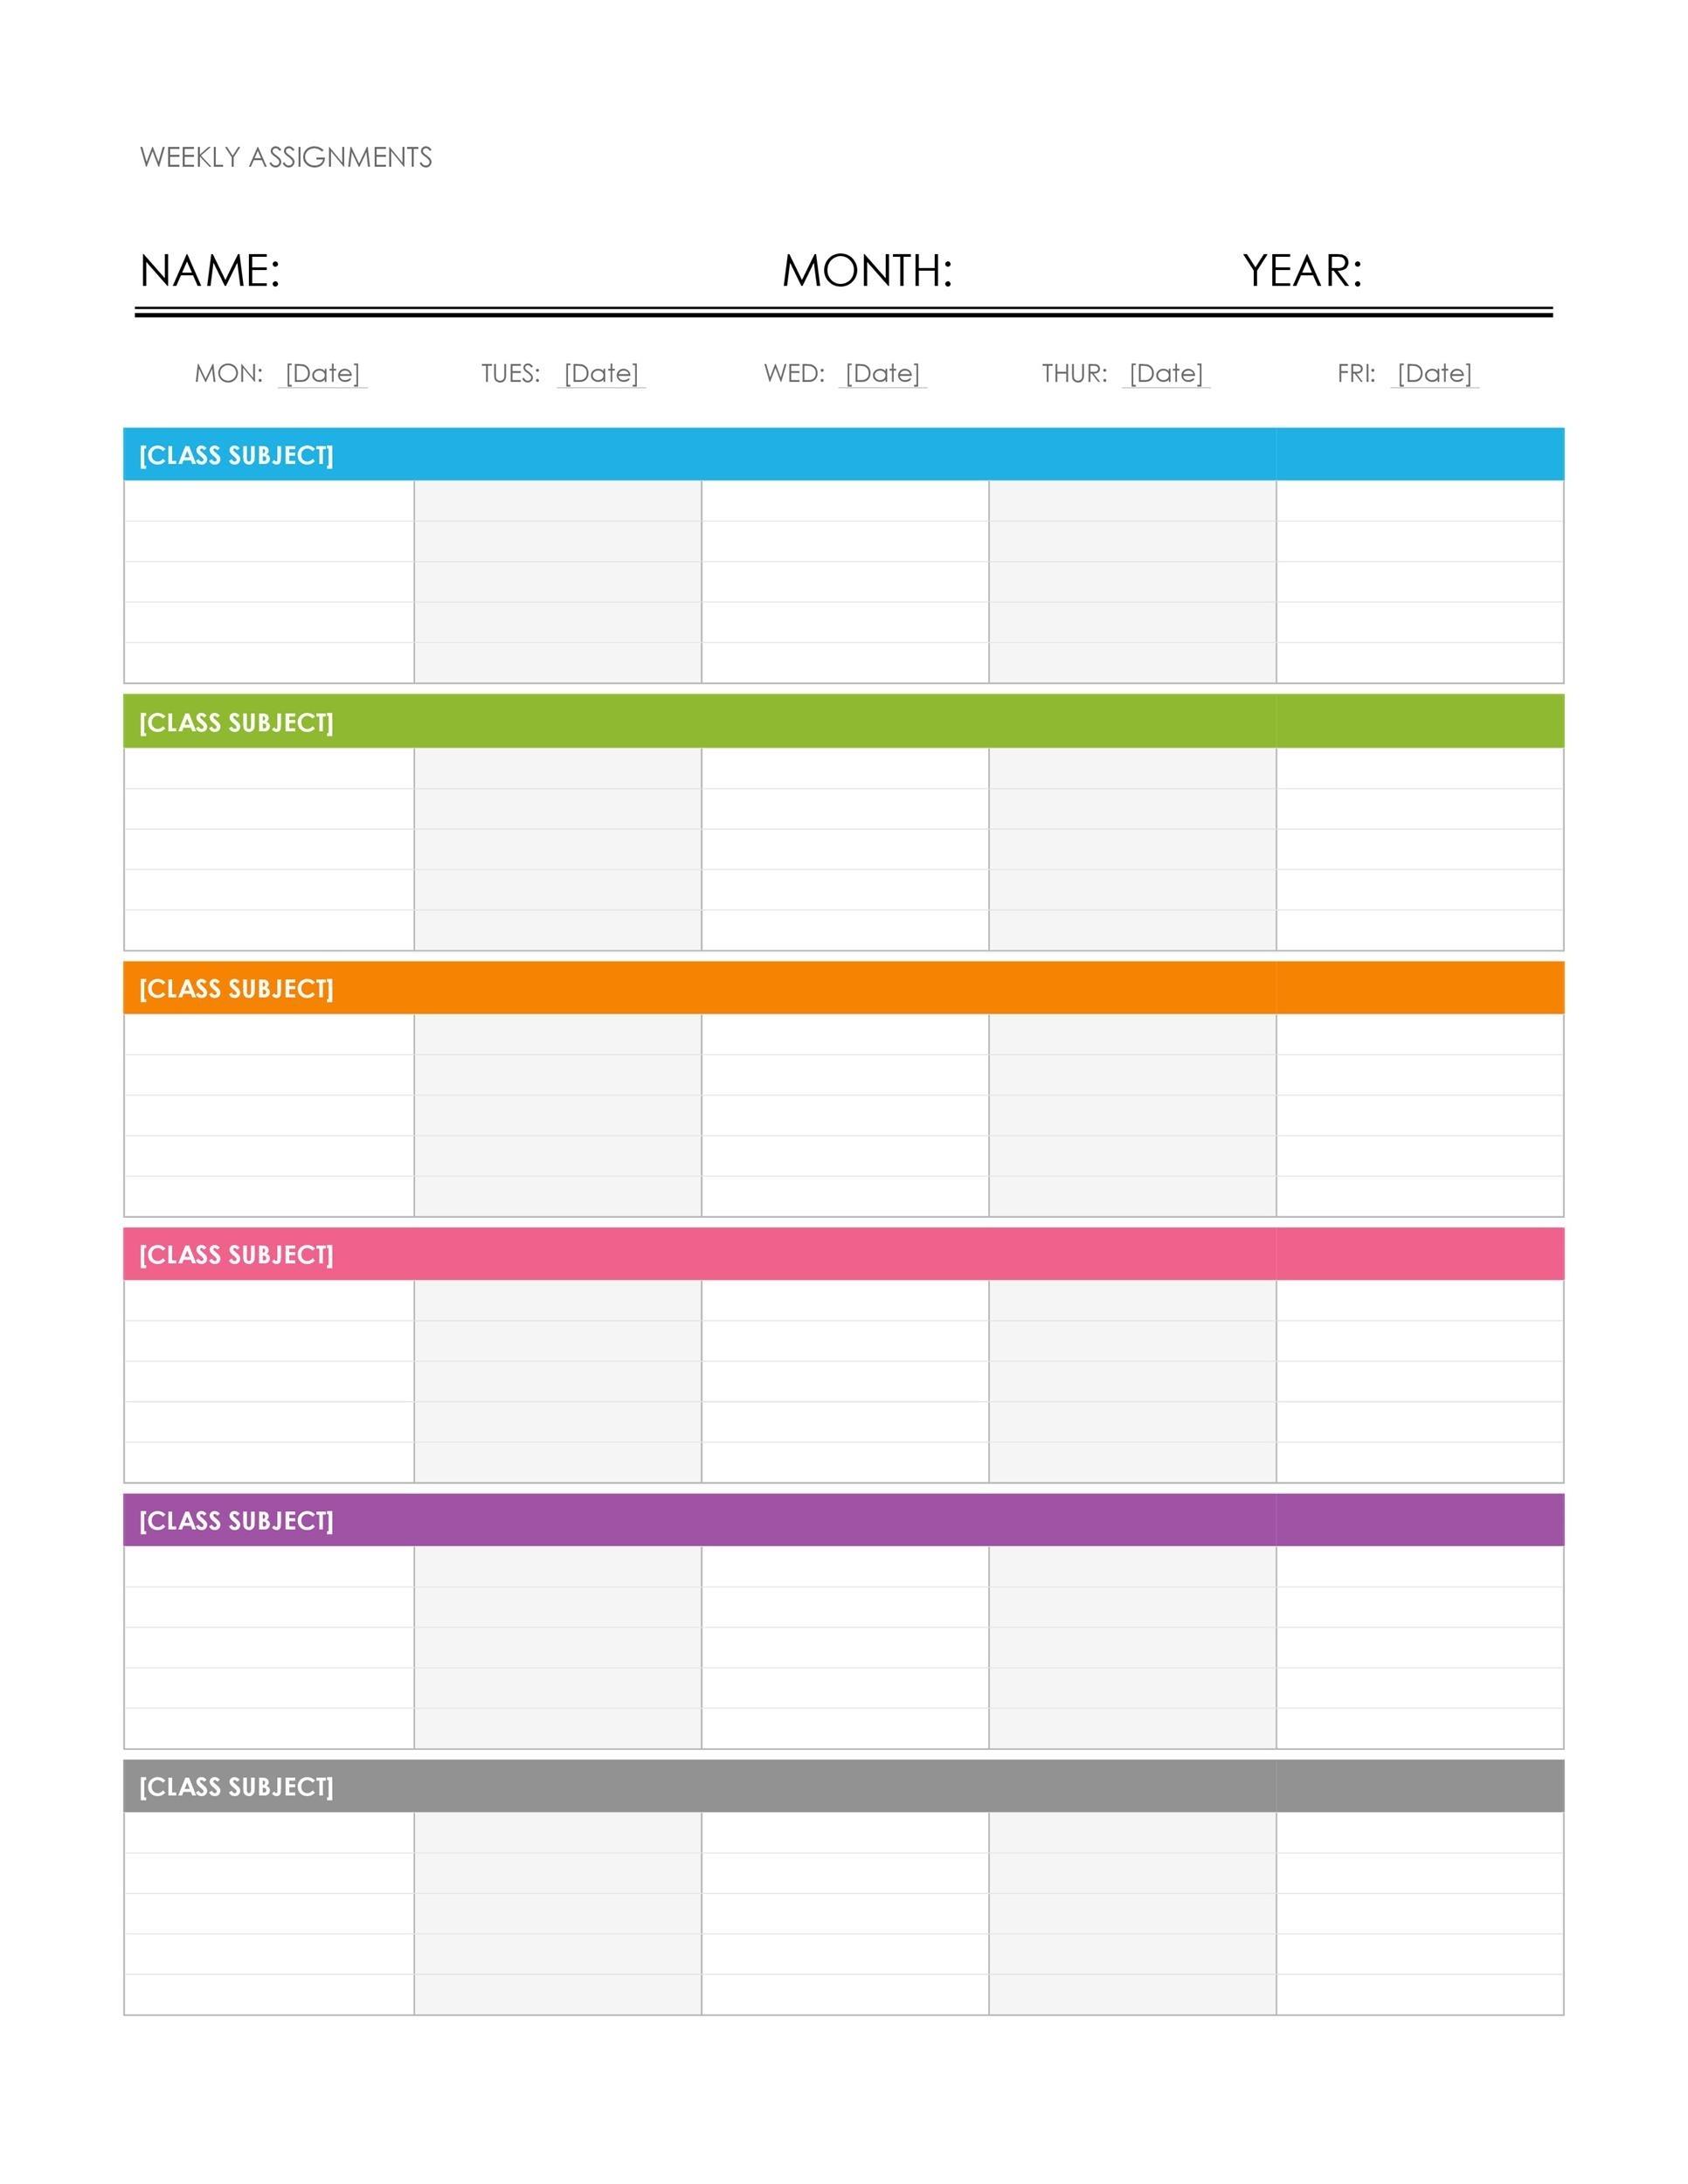 26 Blank Weekly Calendar Templates [Pdf, Excel, Word] ᐅ 7 Day Calendar Template Free